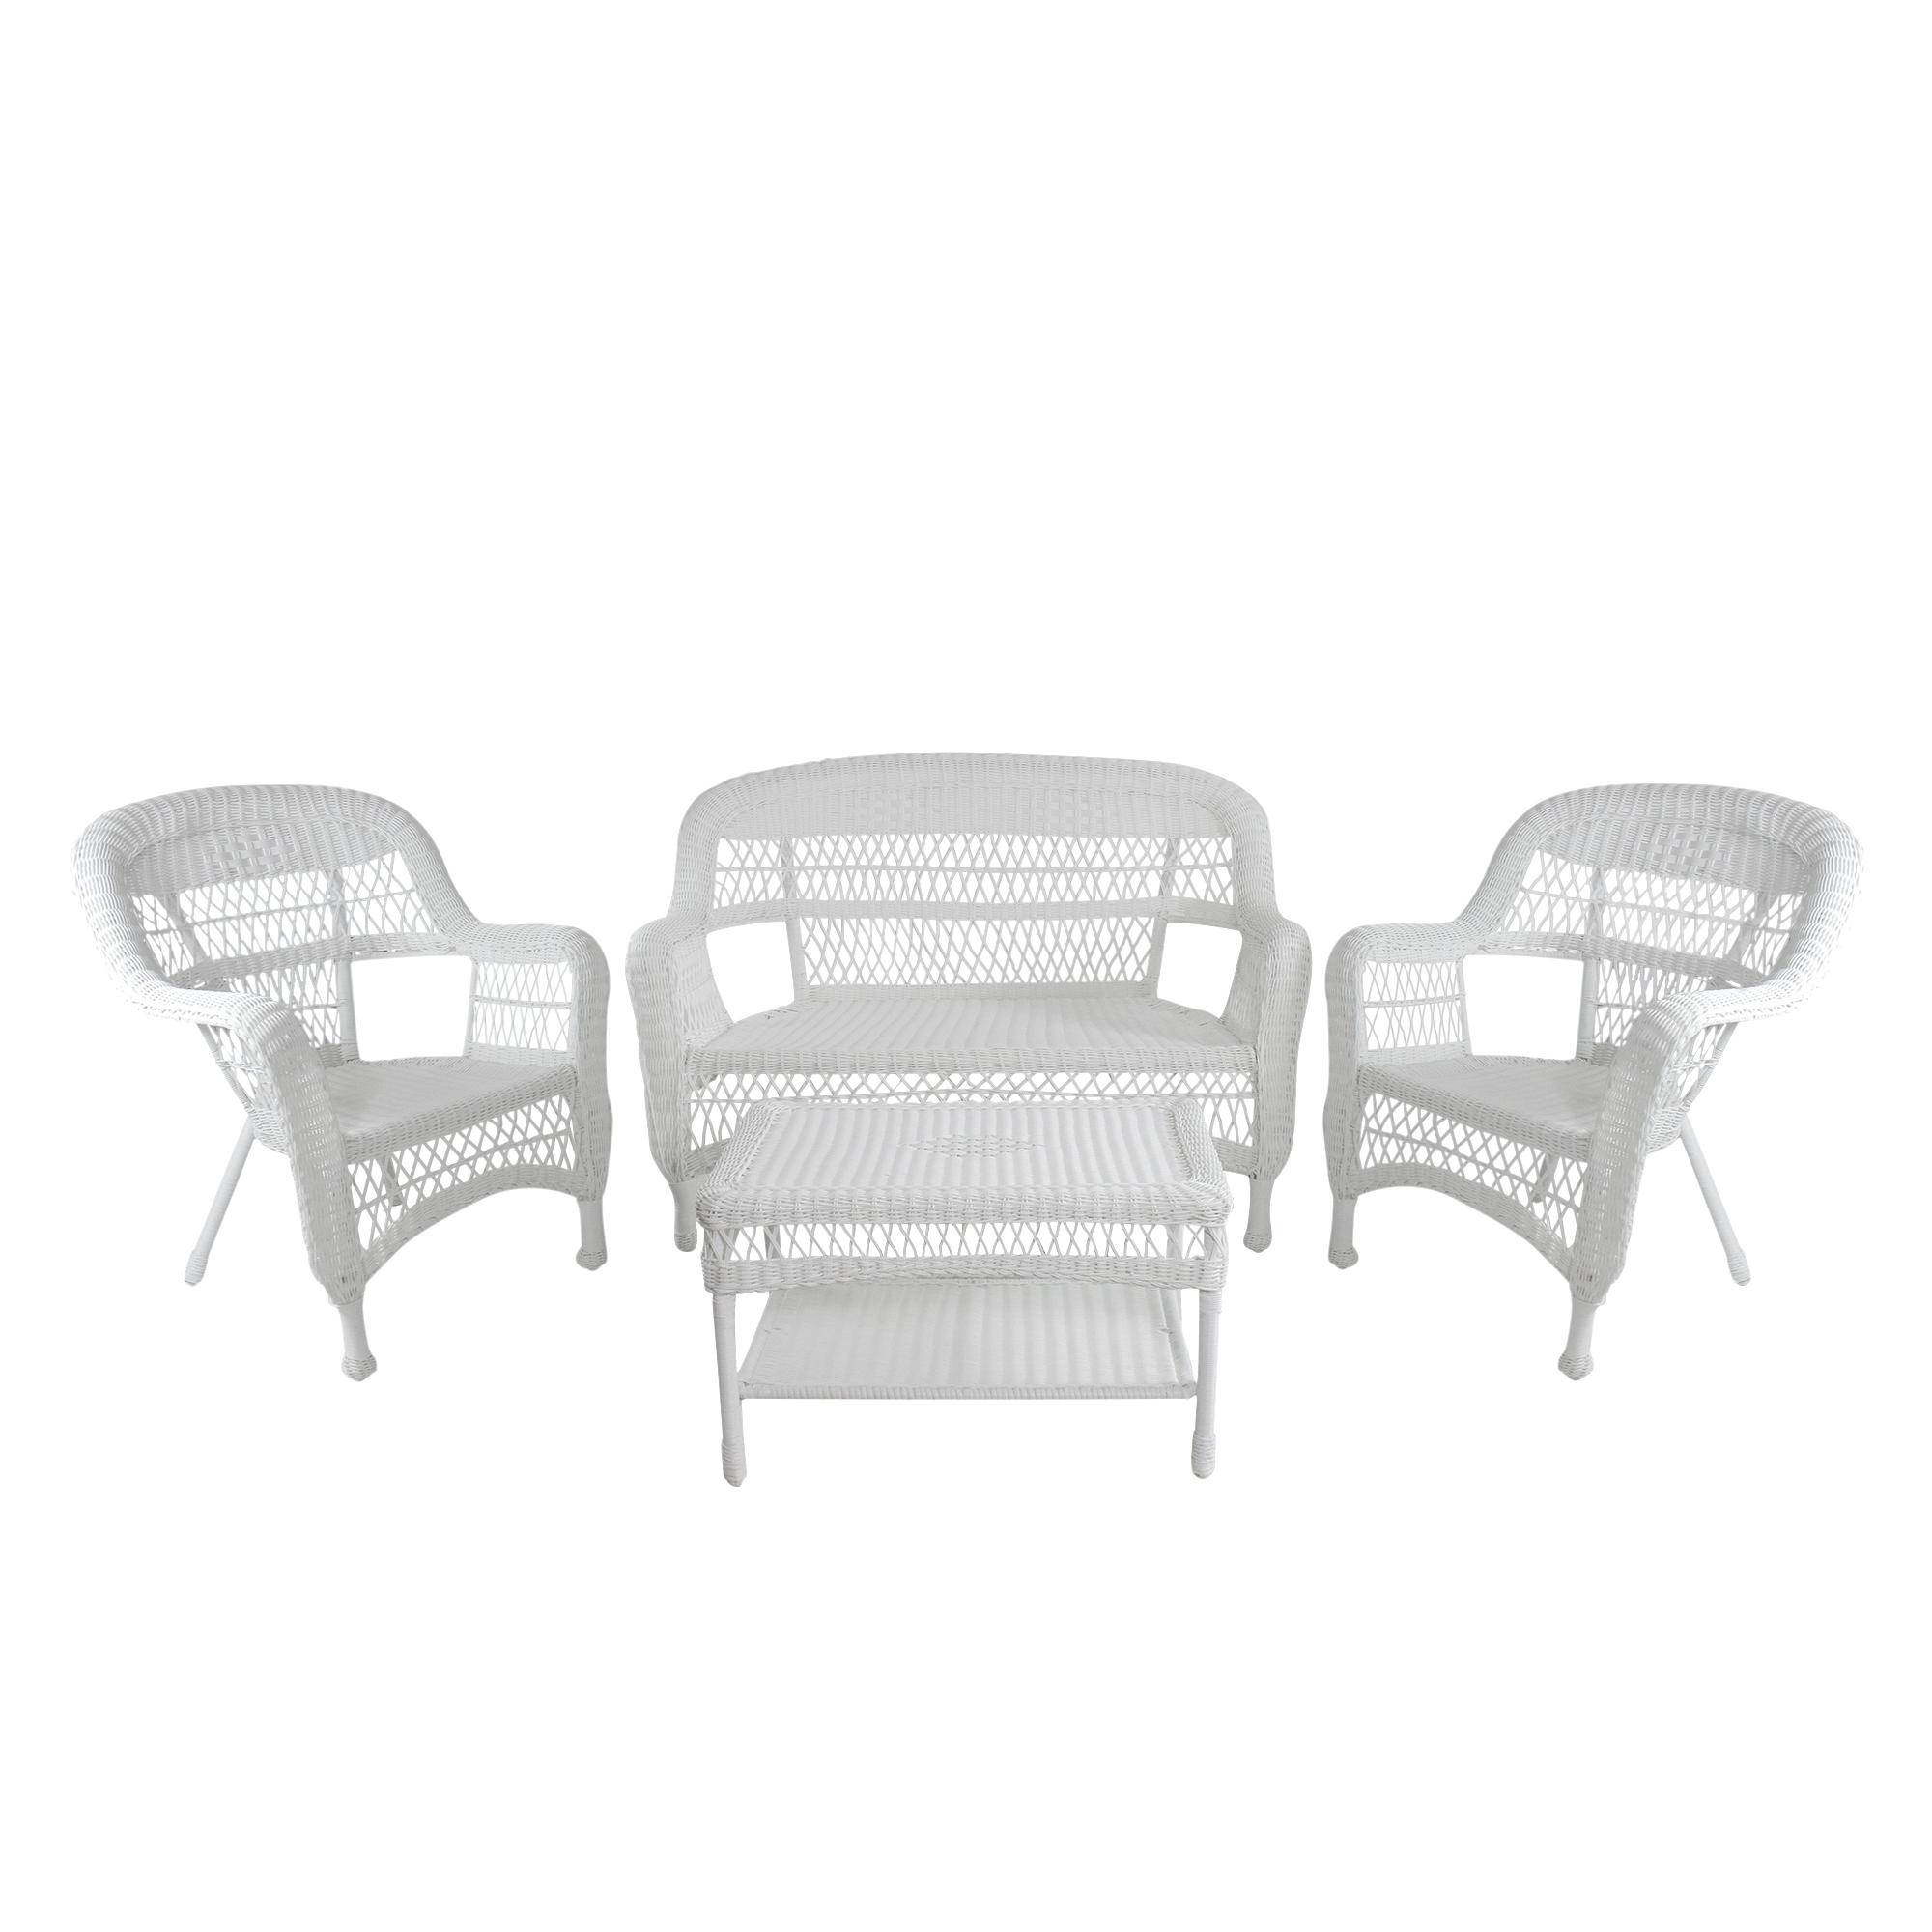 4 piece white steel resin wicker outdoor patio furniture set 51